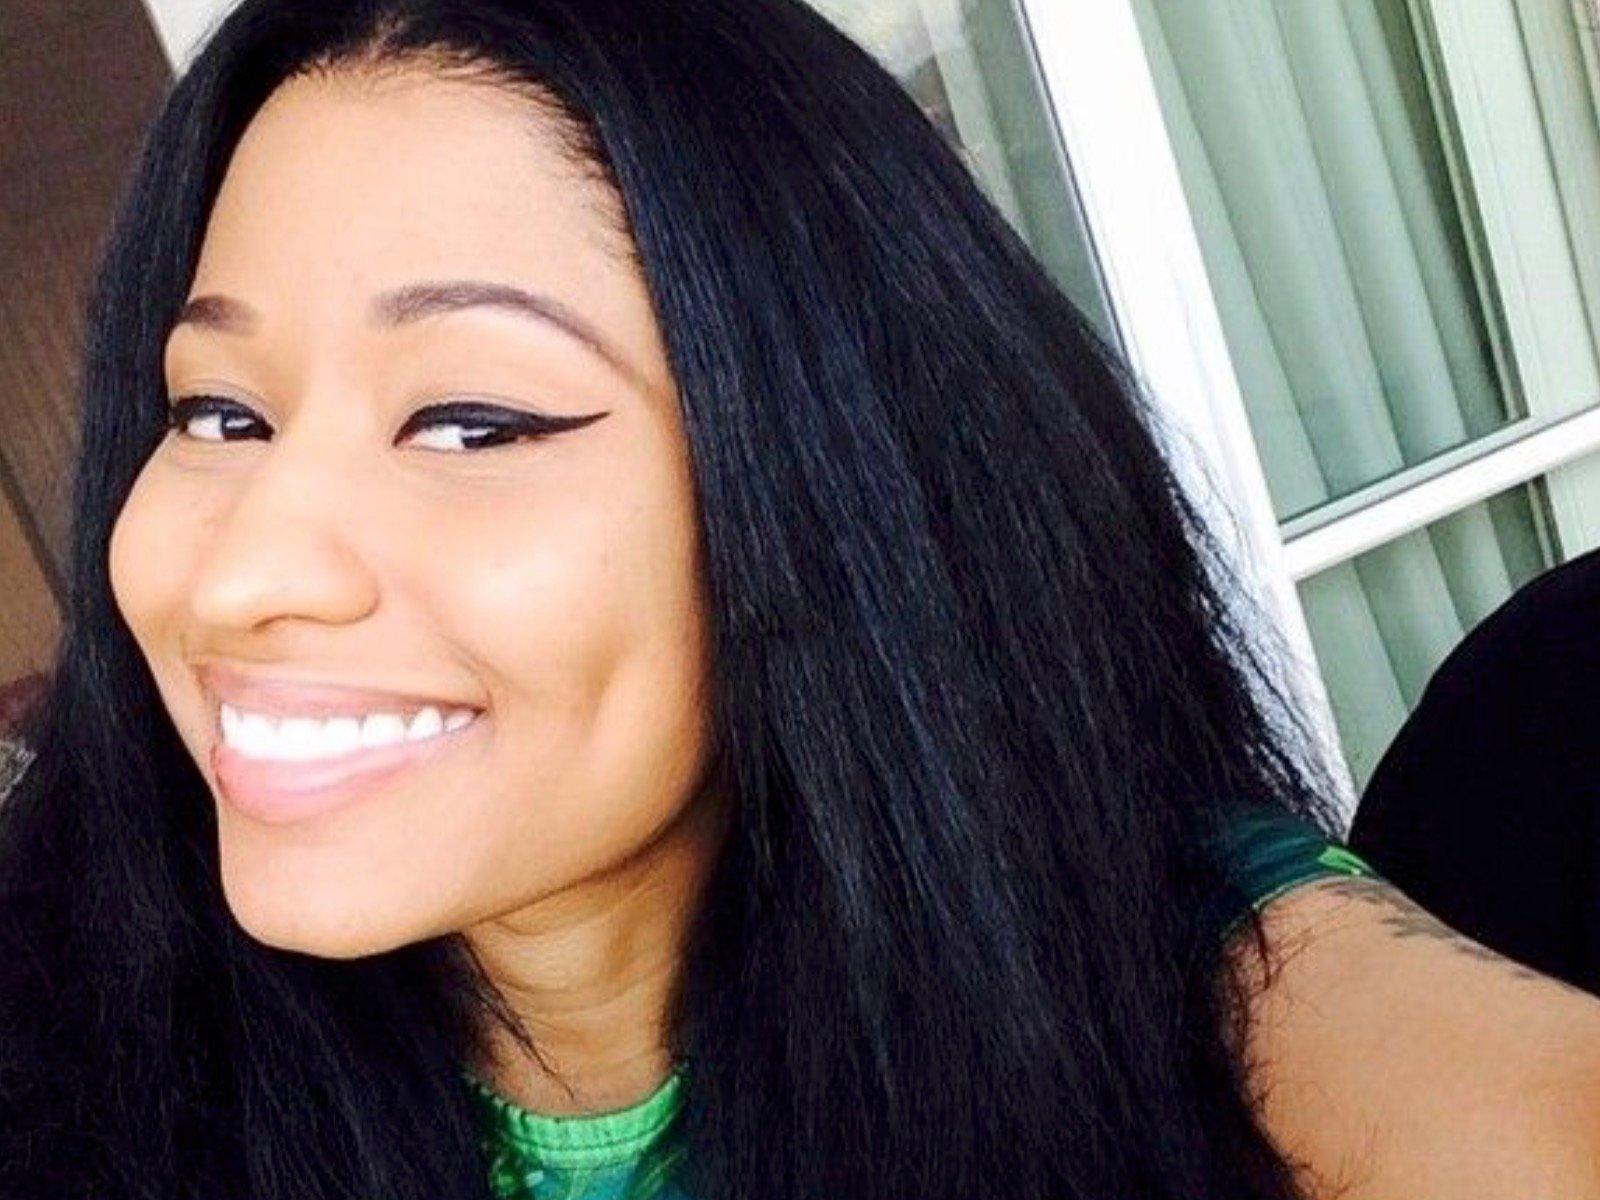 Look: Nicki Minaj Unloads 3 Thick As Ever New Pics